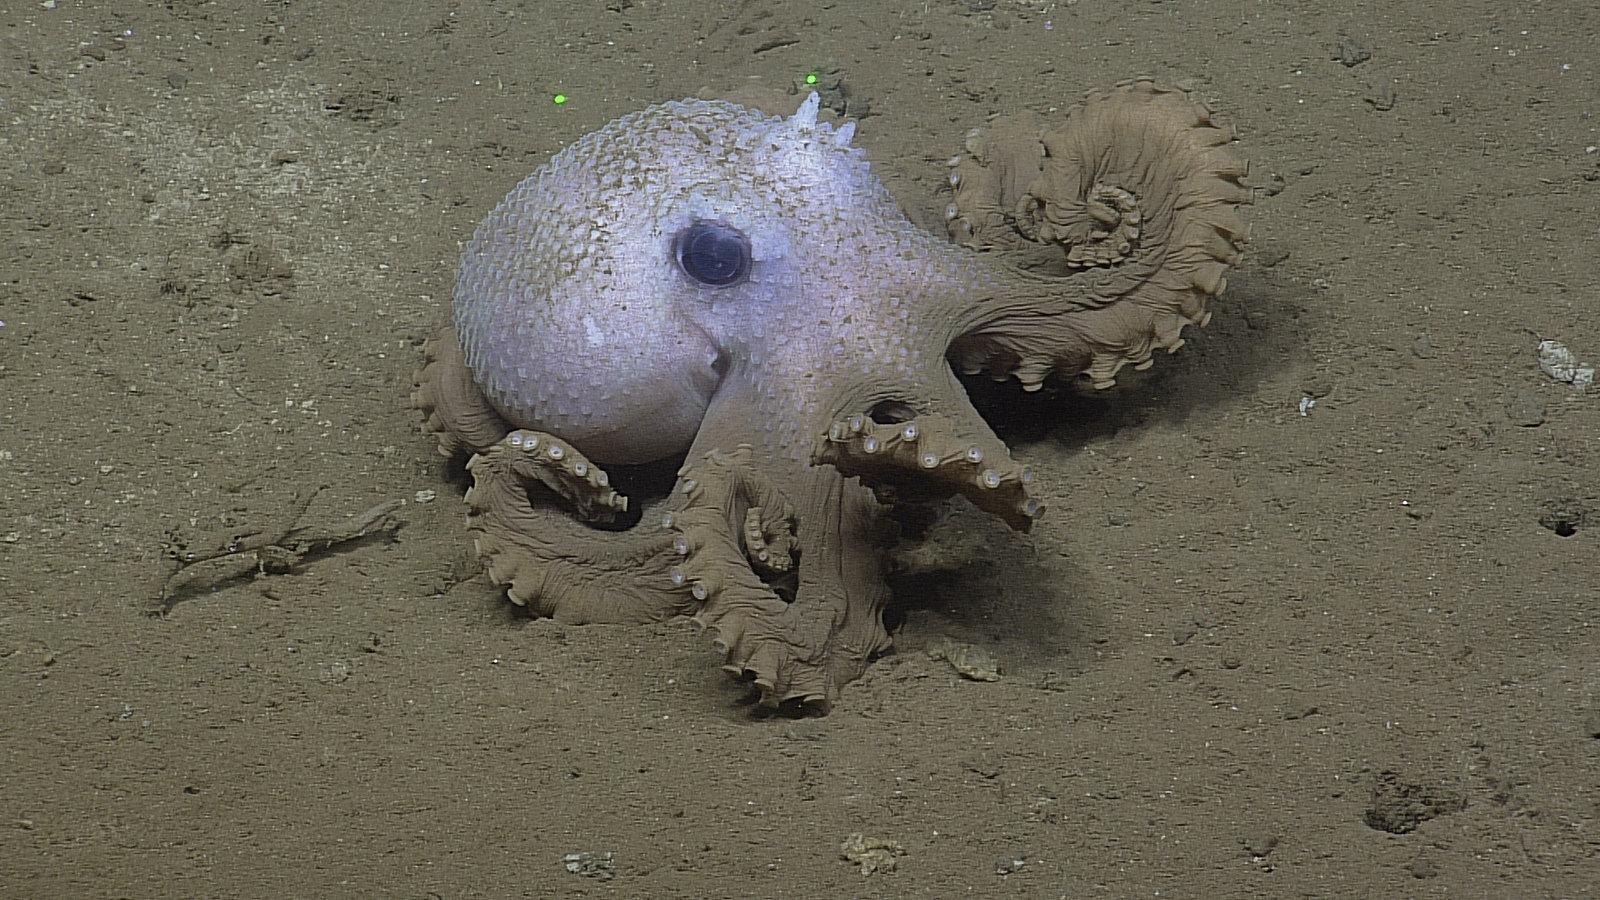 Beautiful octopus exploring the Cascadia Basin area